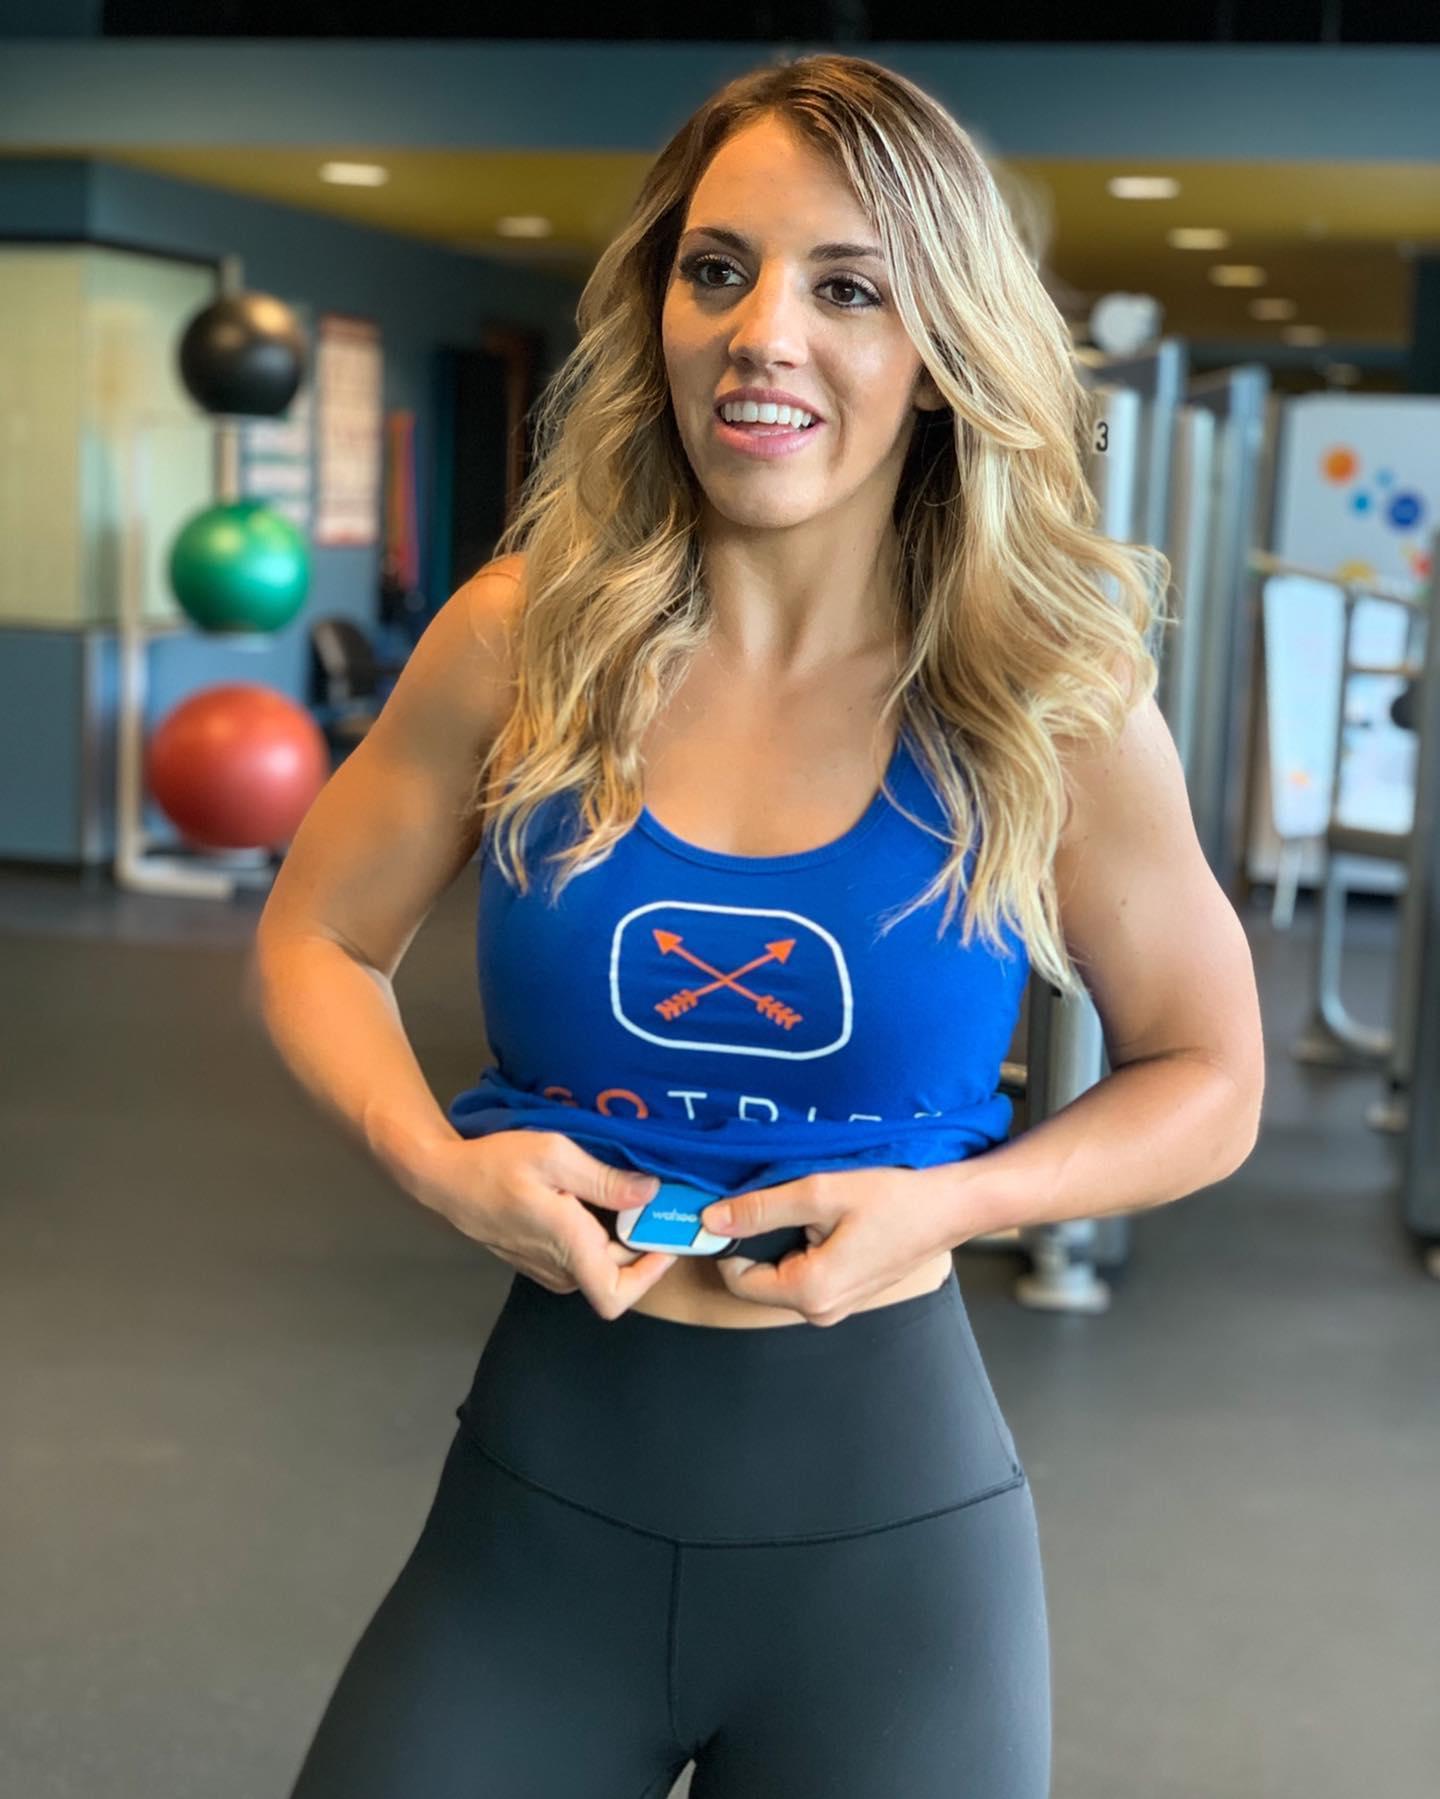 GoTribe Fitness